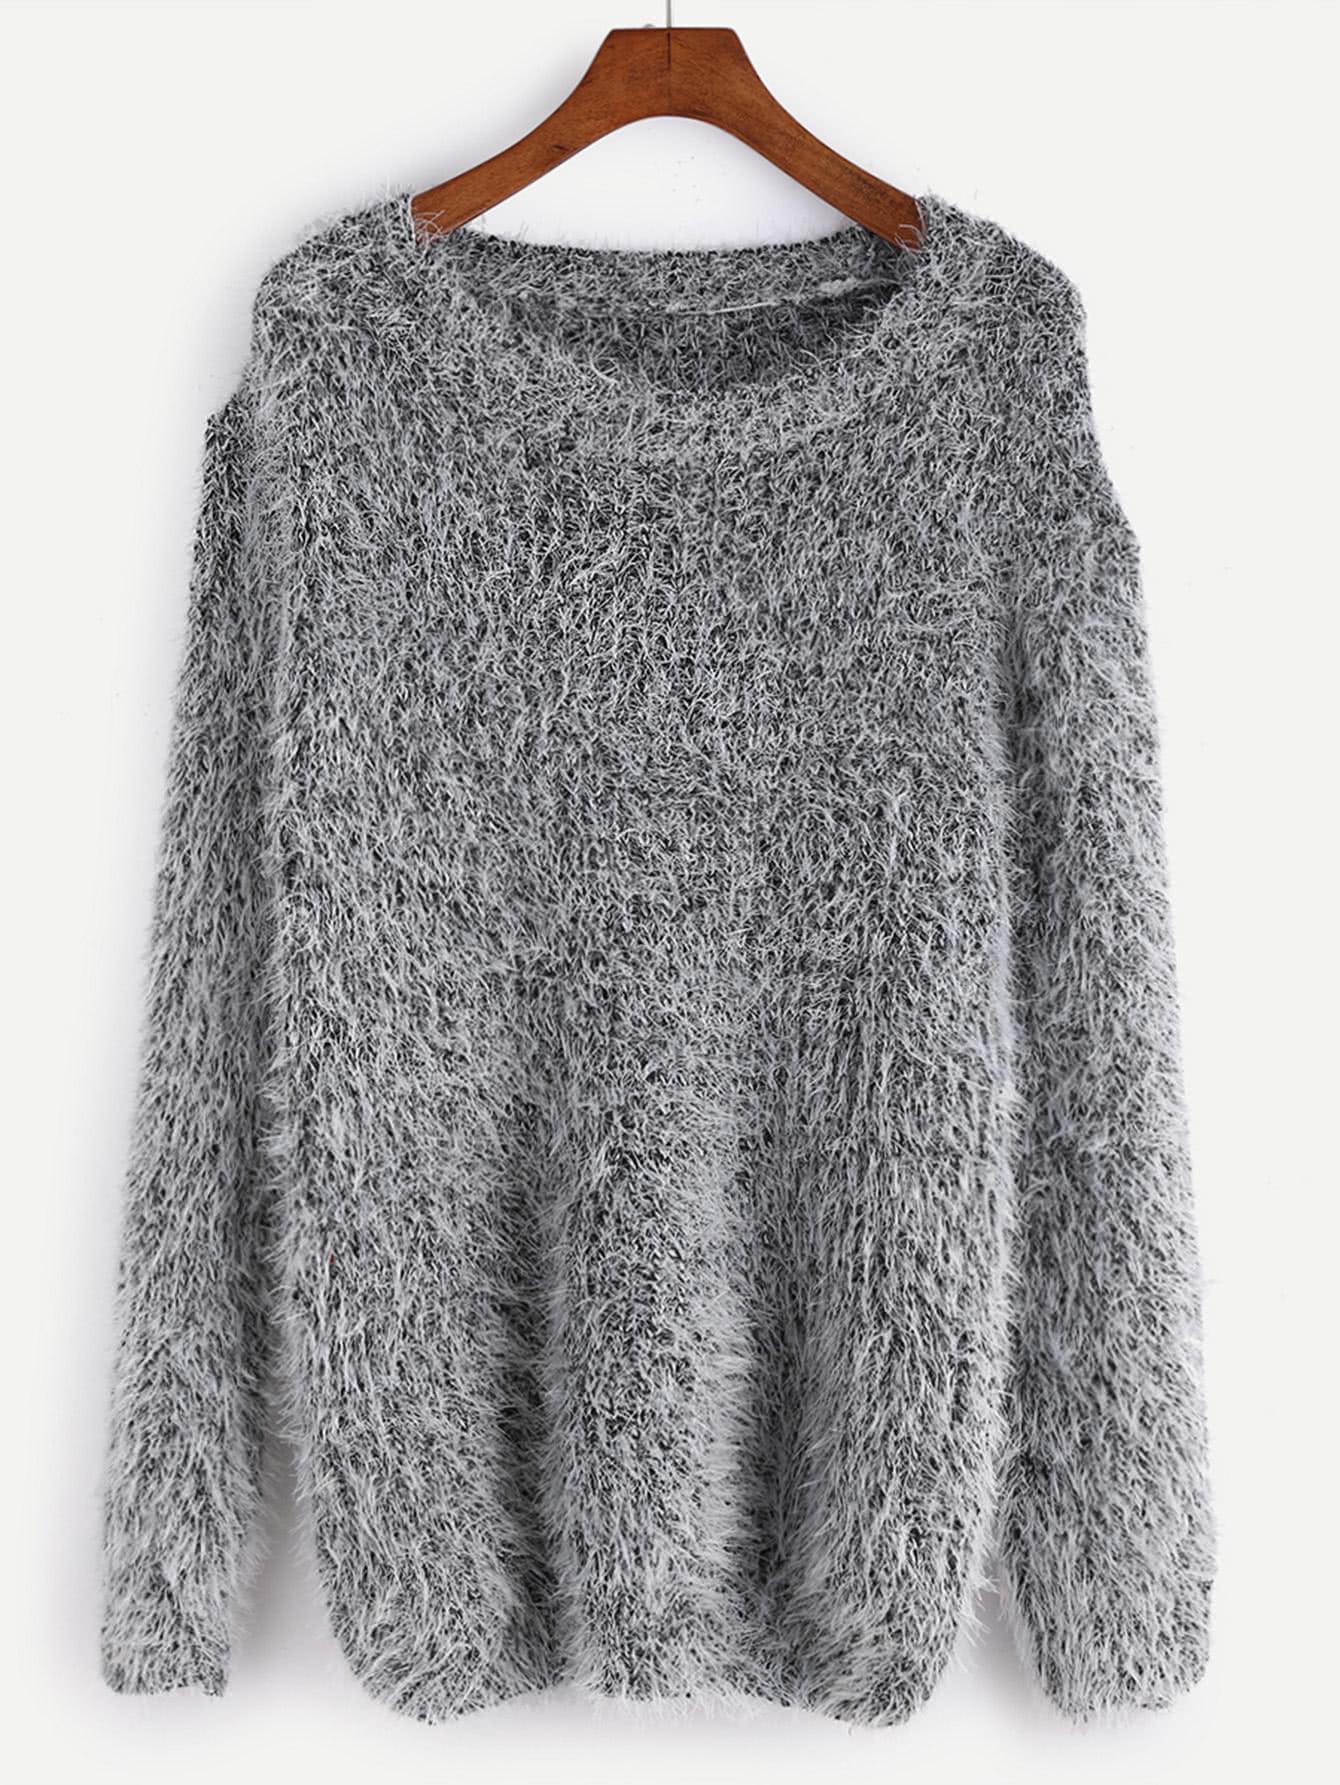 Fuzzy Chunky Knit SweaterFor Women-romwe